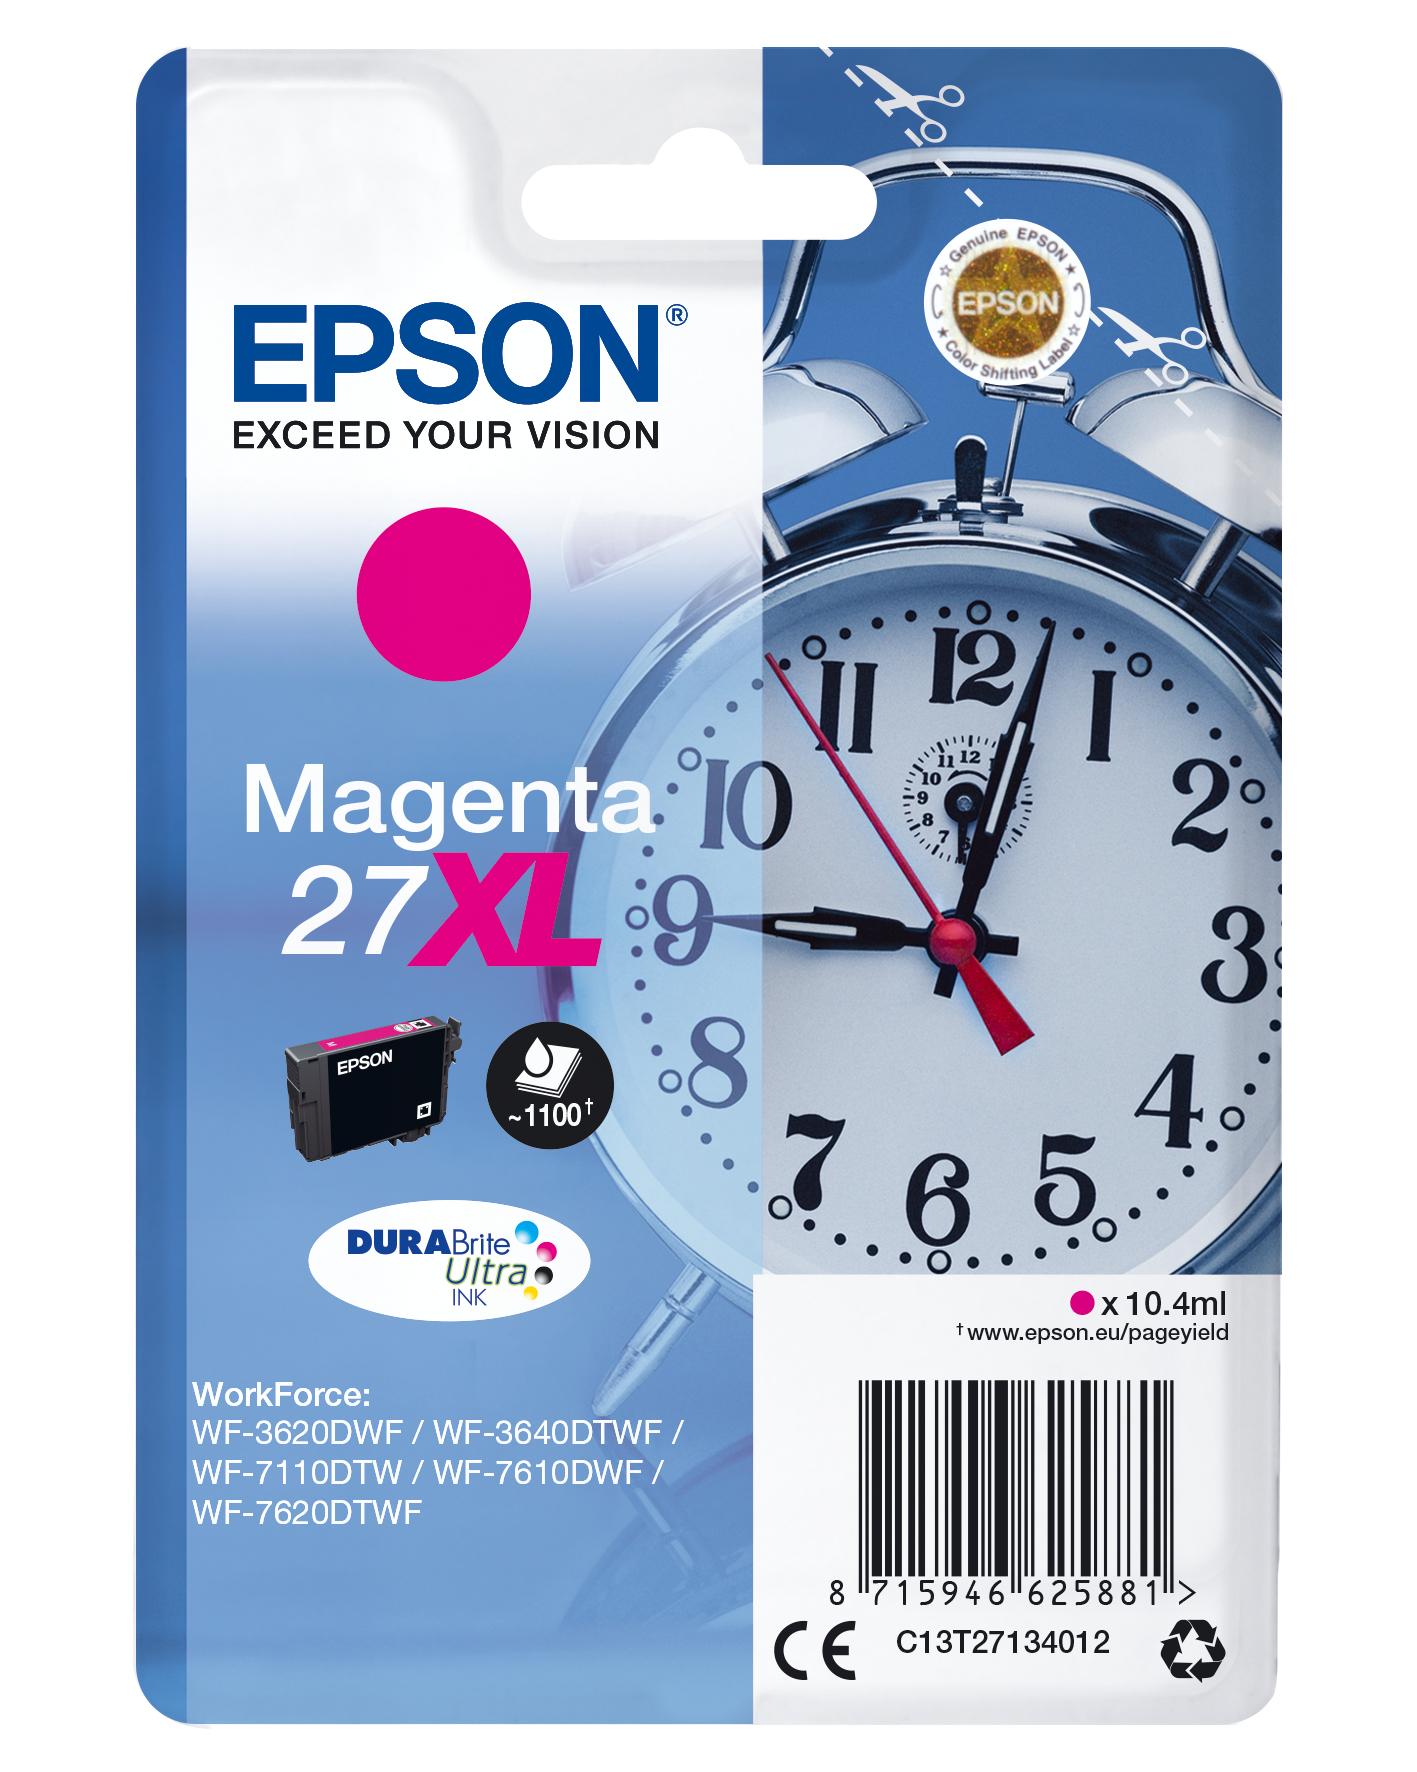 Epson Alarm clock Singlepack Magenta 27XL DURABrite Ultra Ink